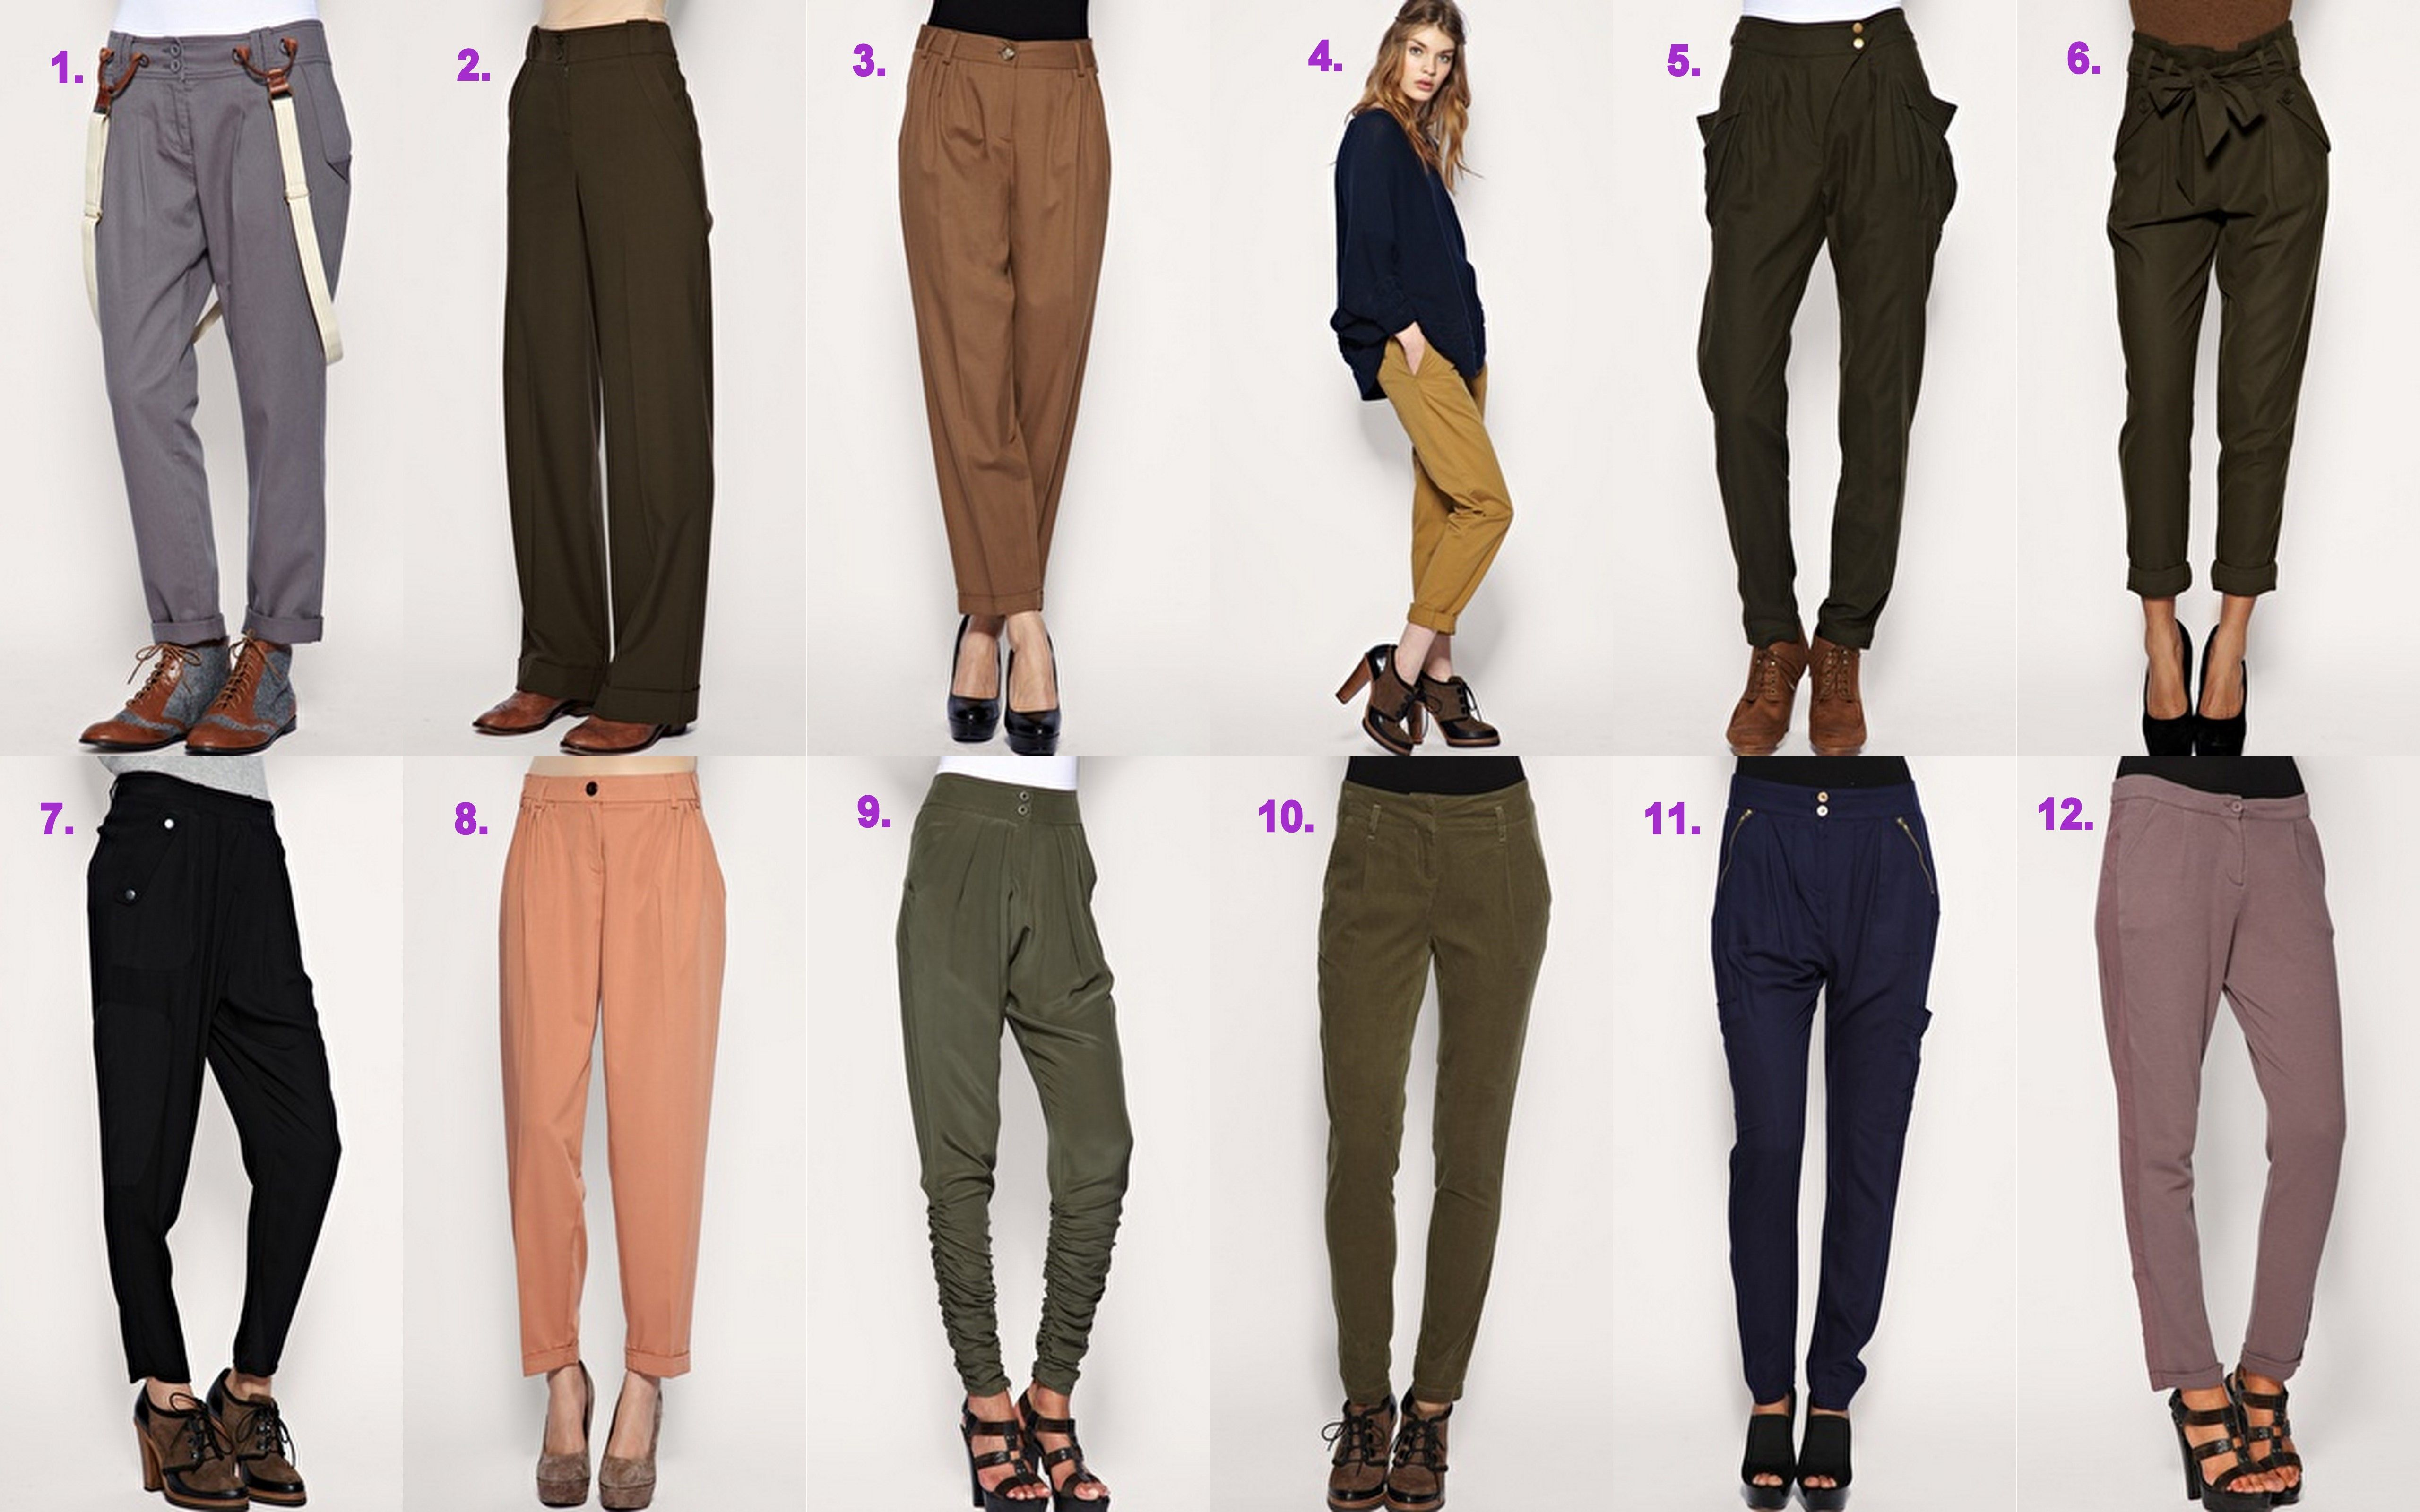 Women Pants Styles